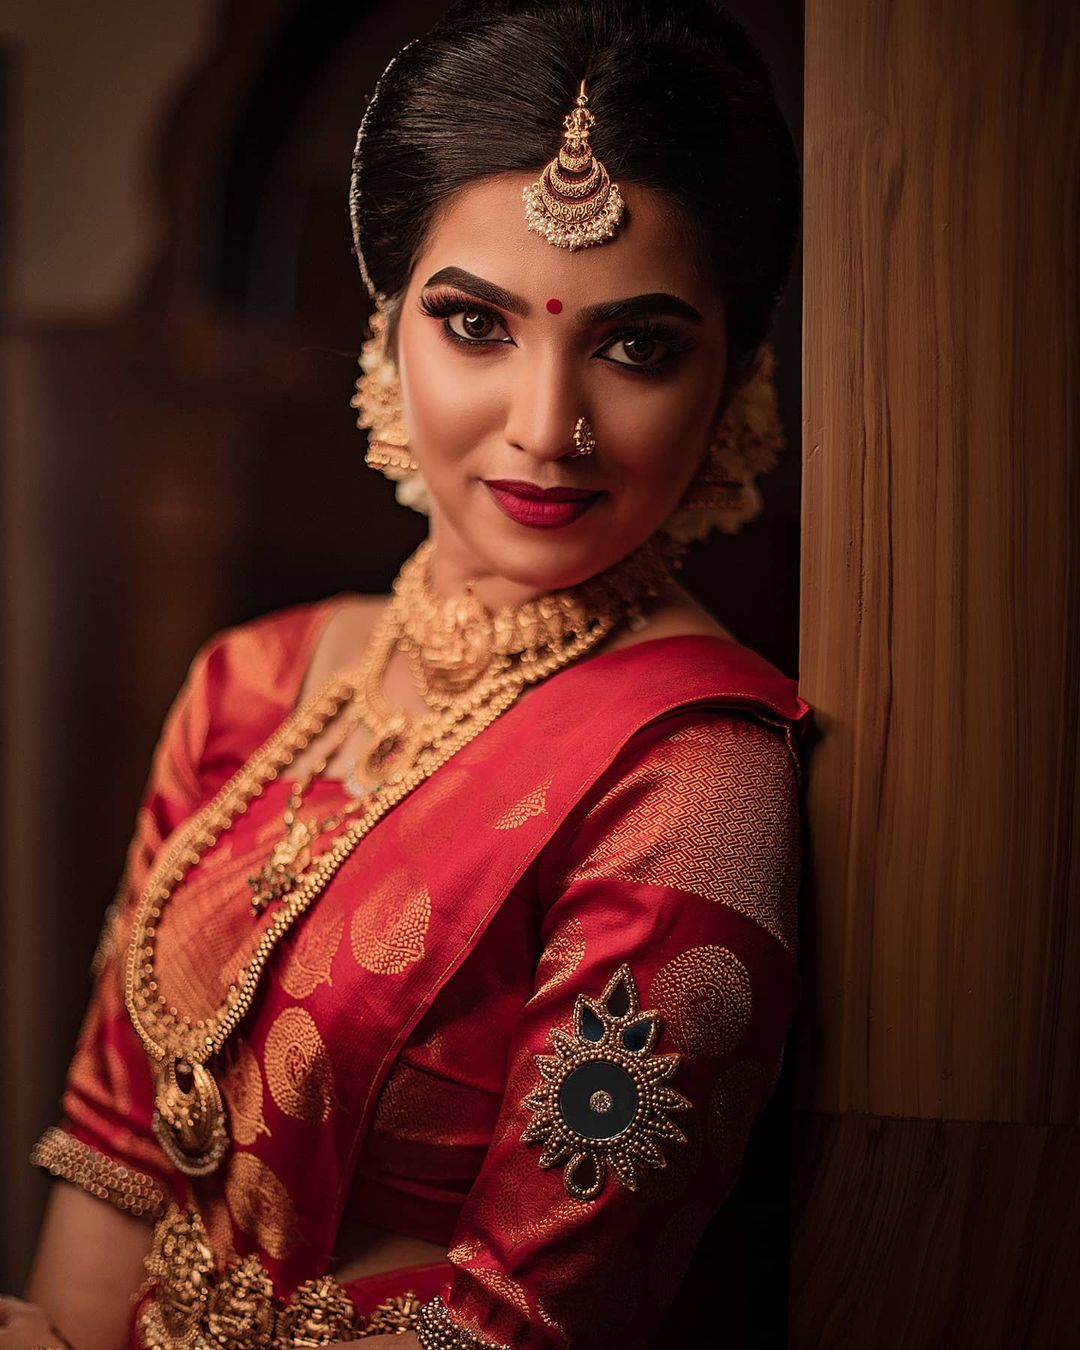 wedding photography royal bride by nidhin foma